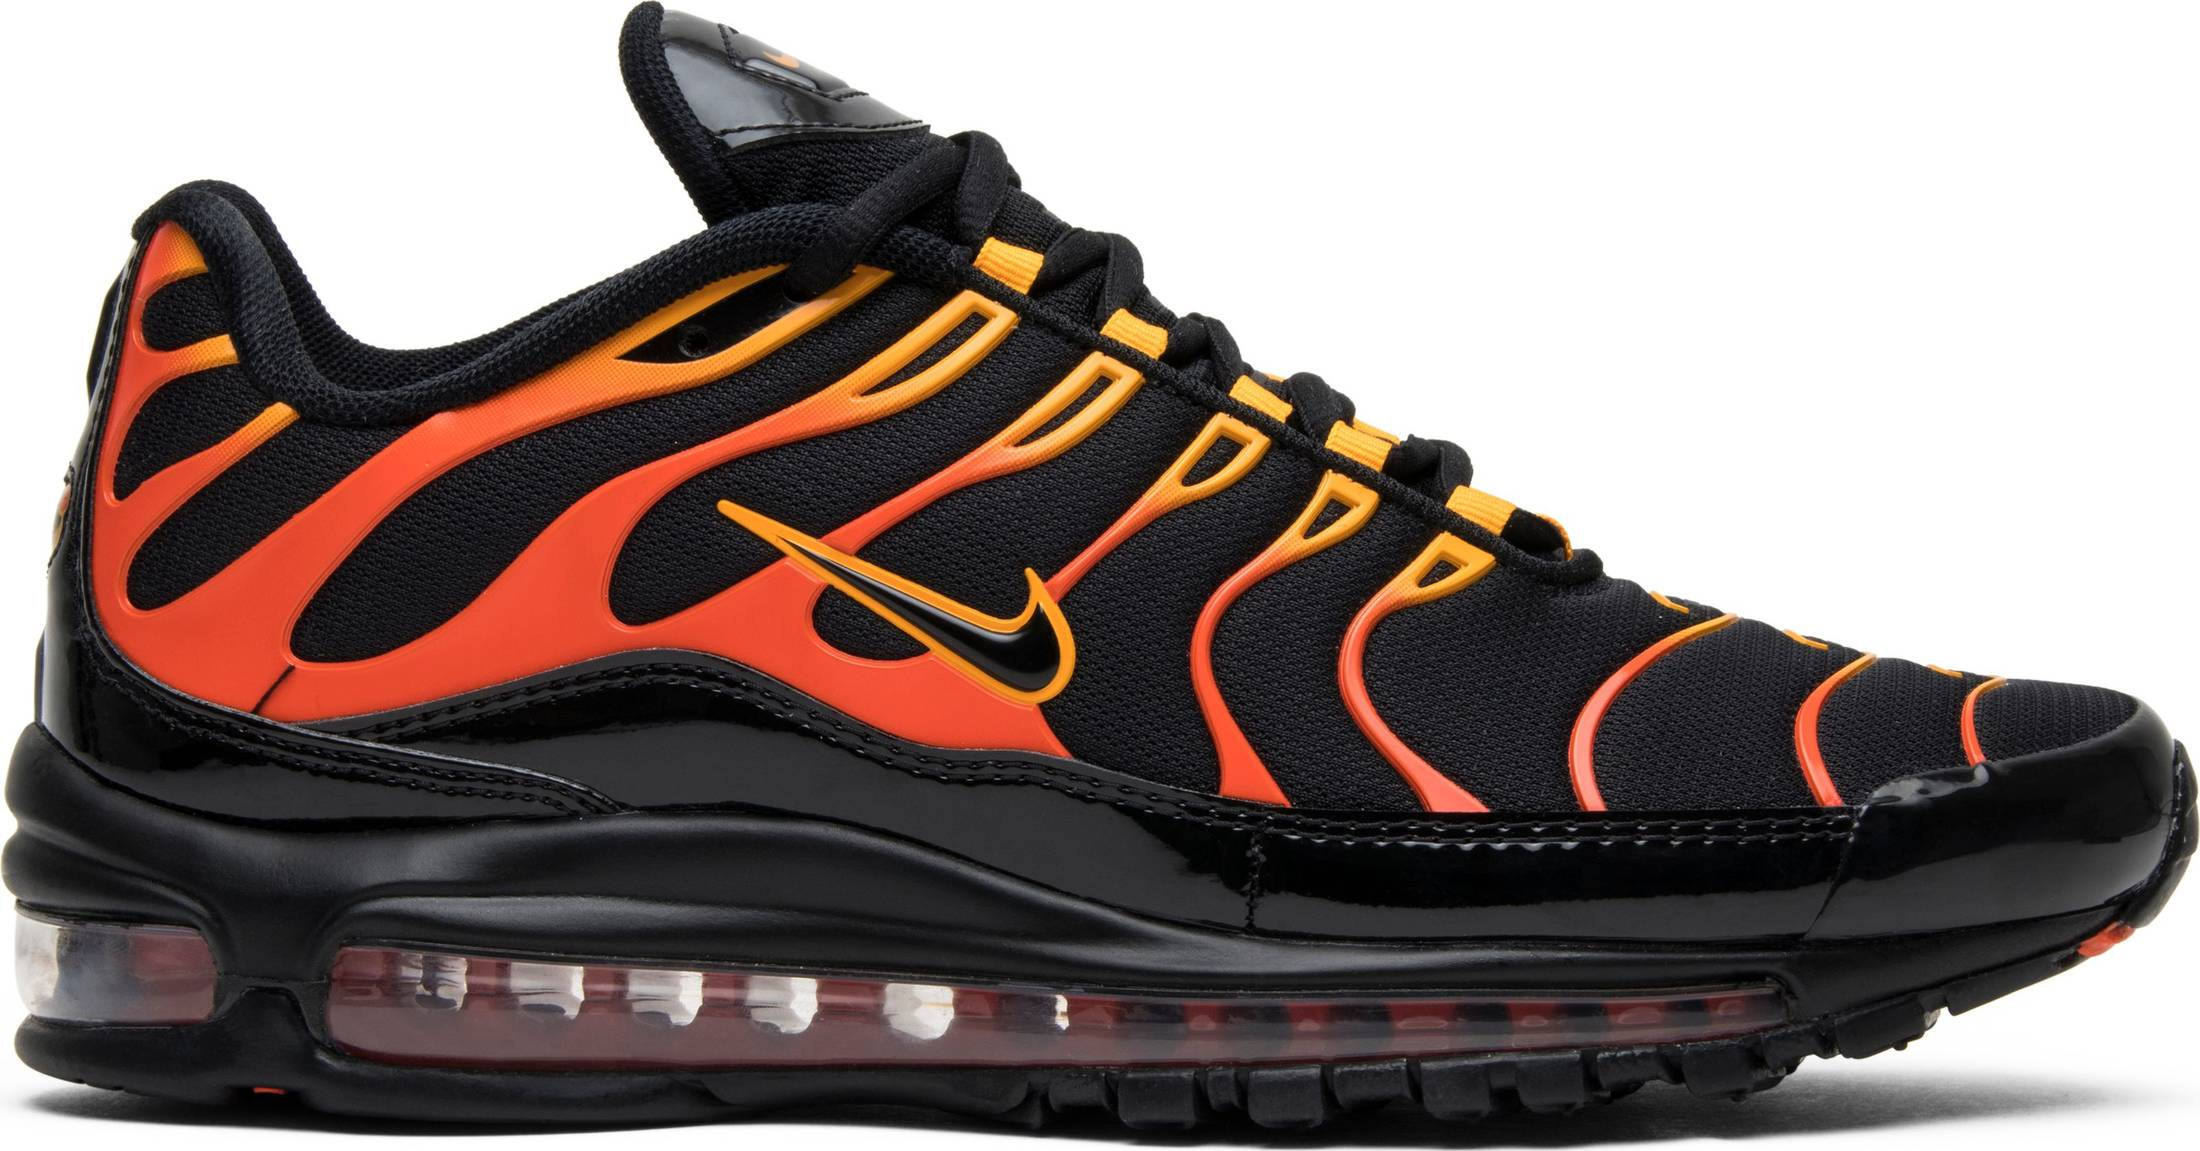 classic styles dirt cheap beauty Air Max 97 Plus 'Shock Orange' - Nike - AH8144 002 | GOAT